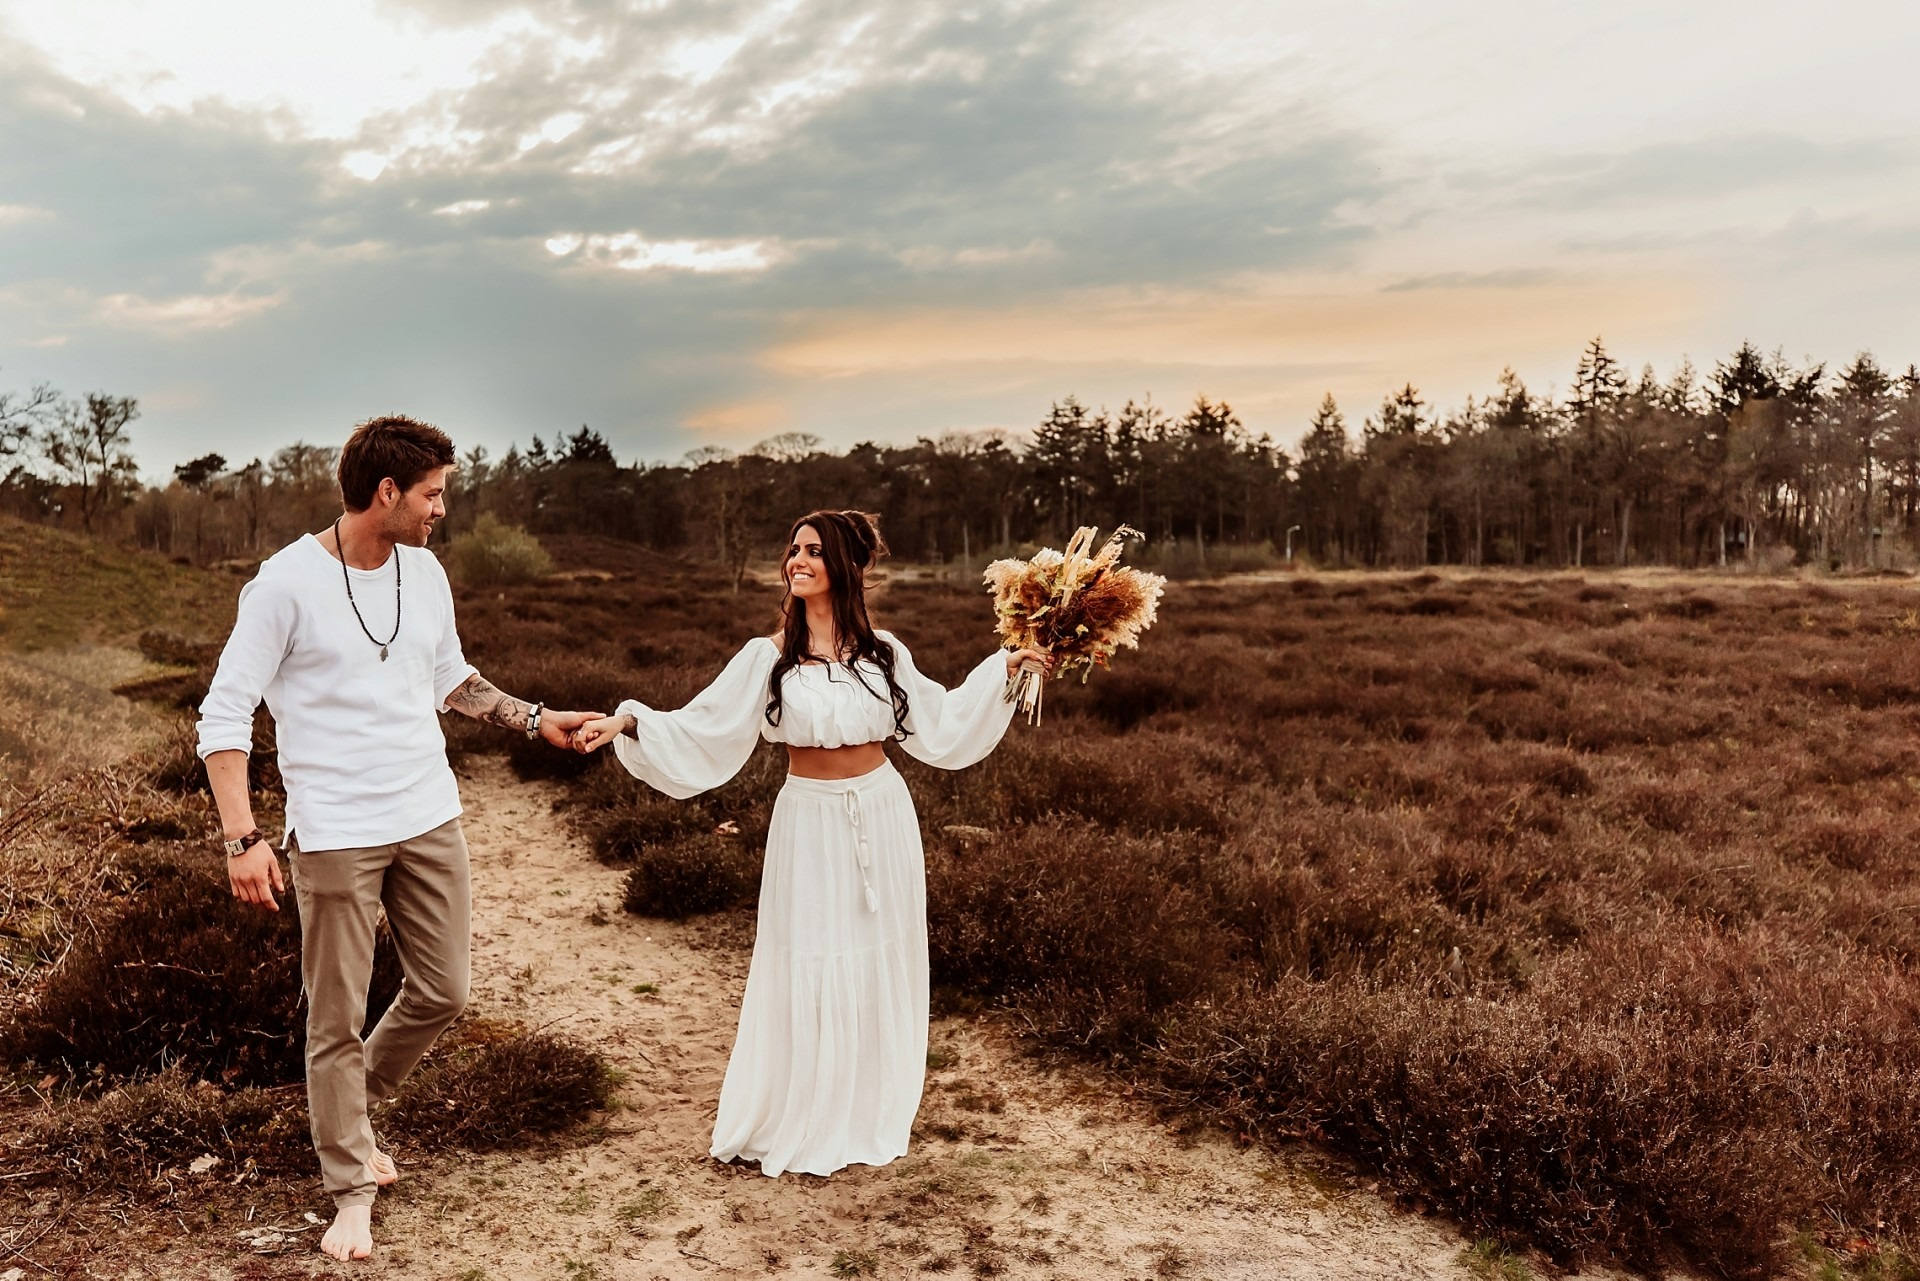 Loveshoot Nijmegen, Boho wedding, Elainefotografie